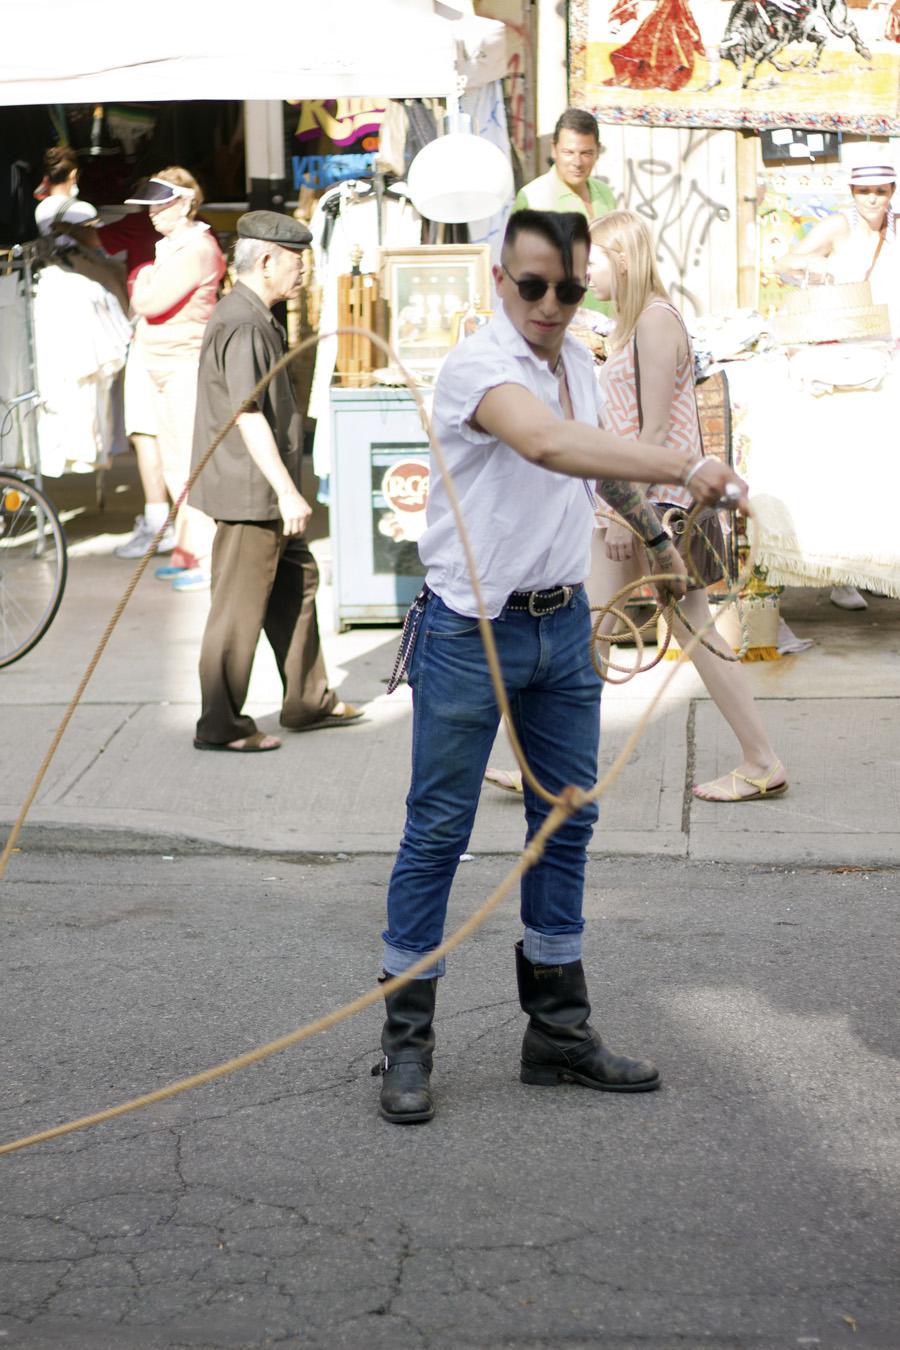 lasso whip rope toronto market